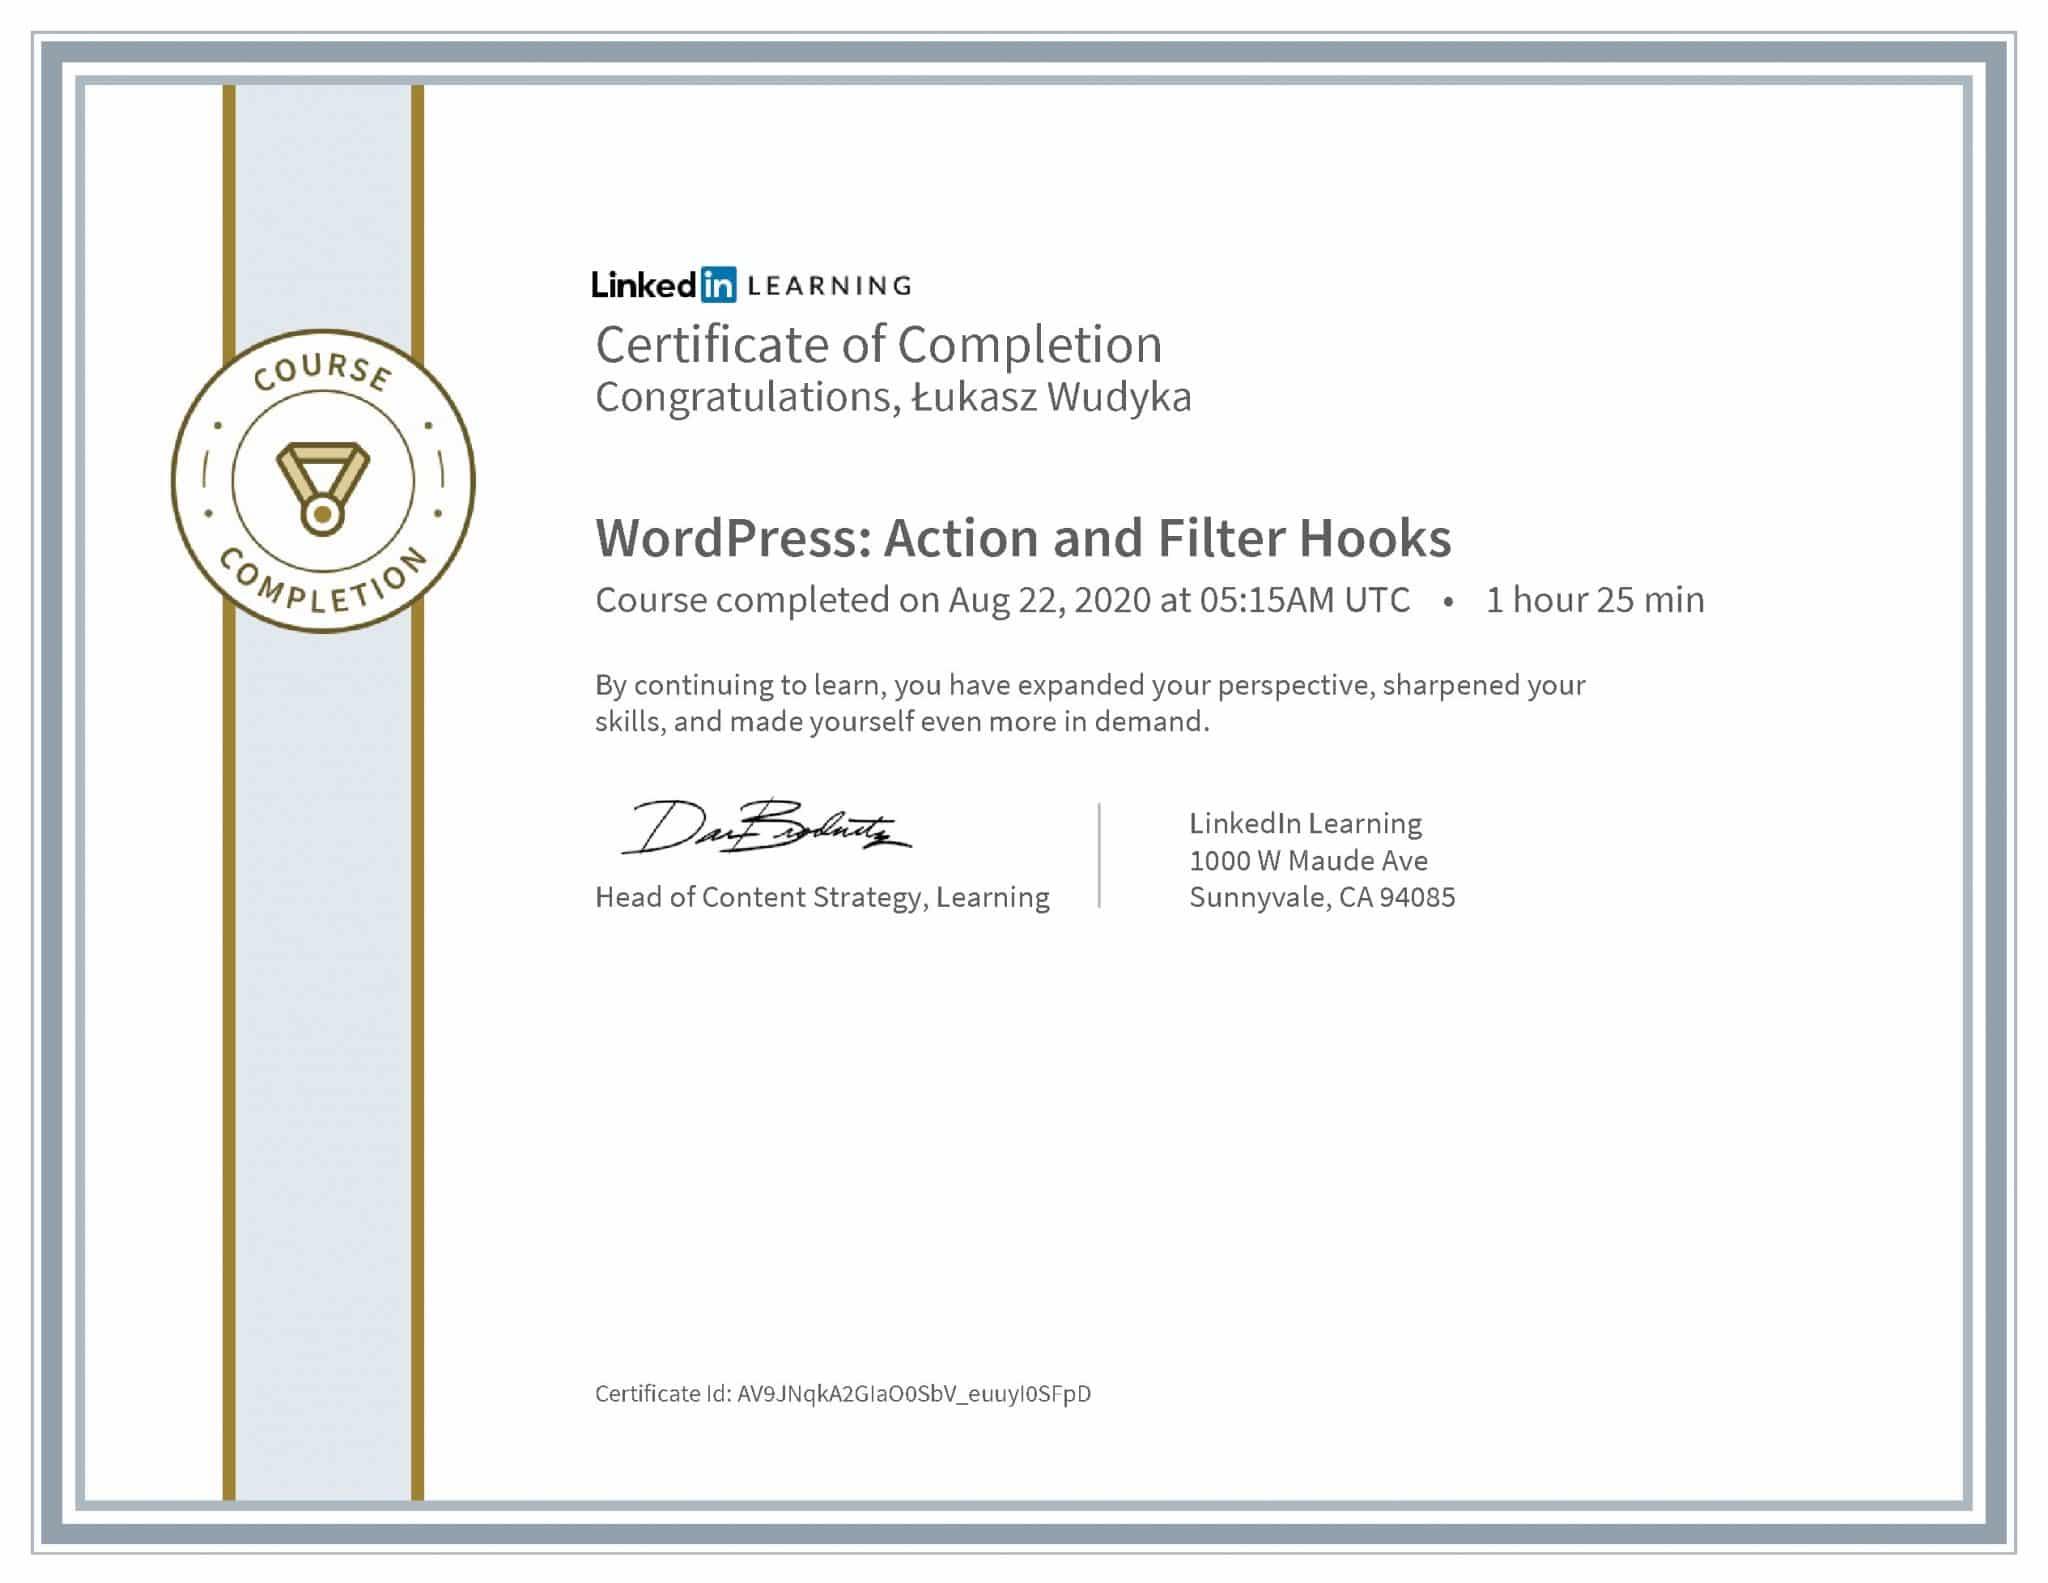 Łukasz Wudyka certyfikat LinkedIn WordPress: Action and Filter Hooks